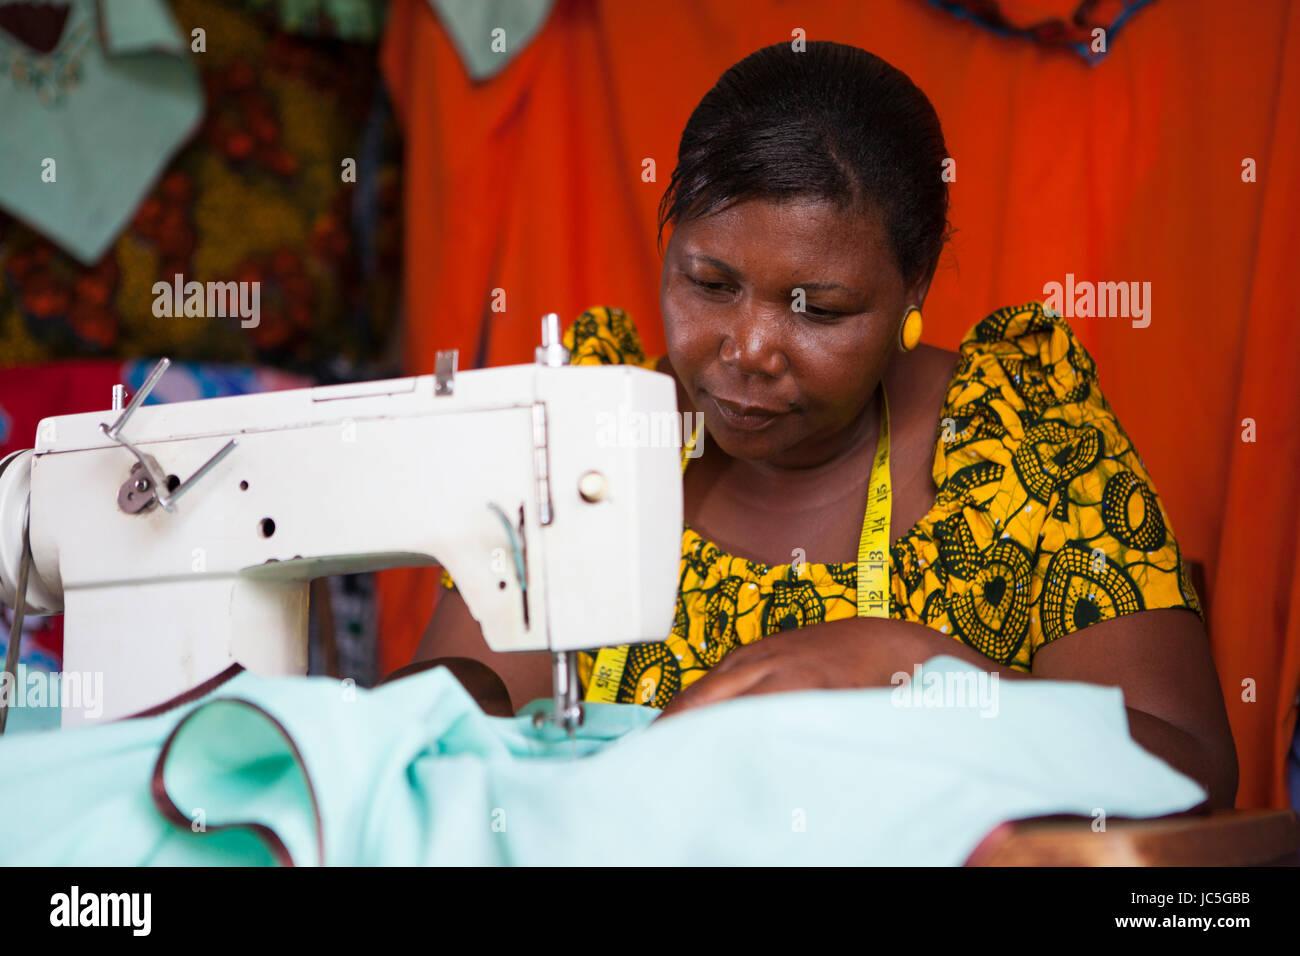 Femme tailleur, Tanzanie, Afrique. Photo Stock